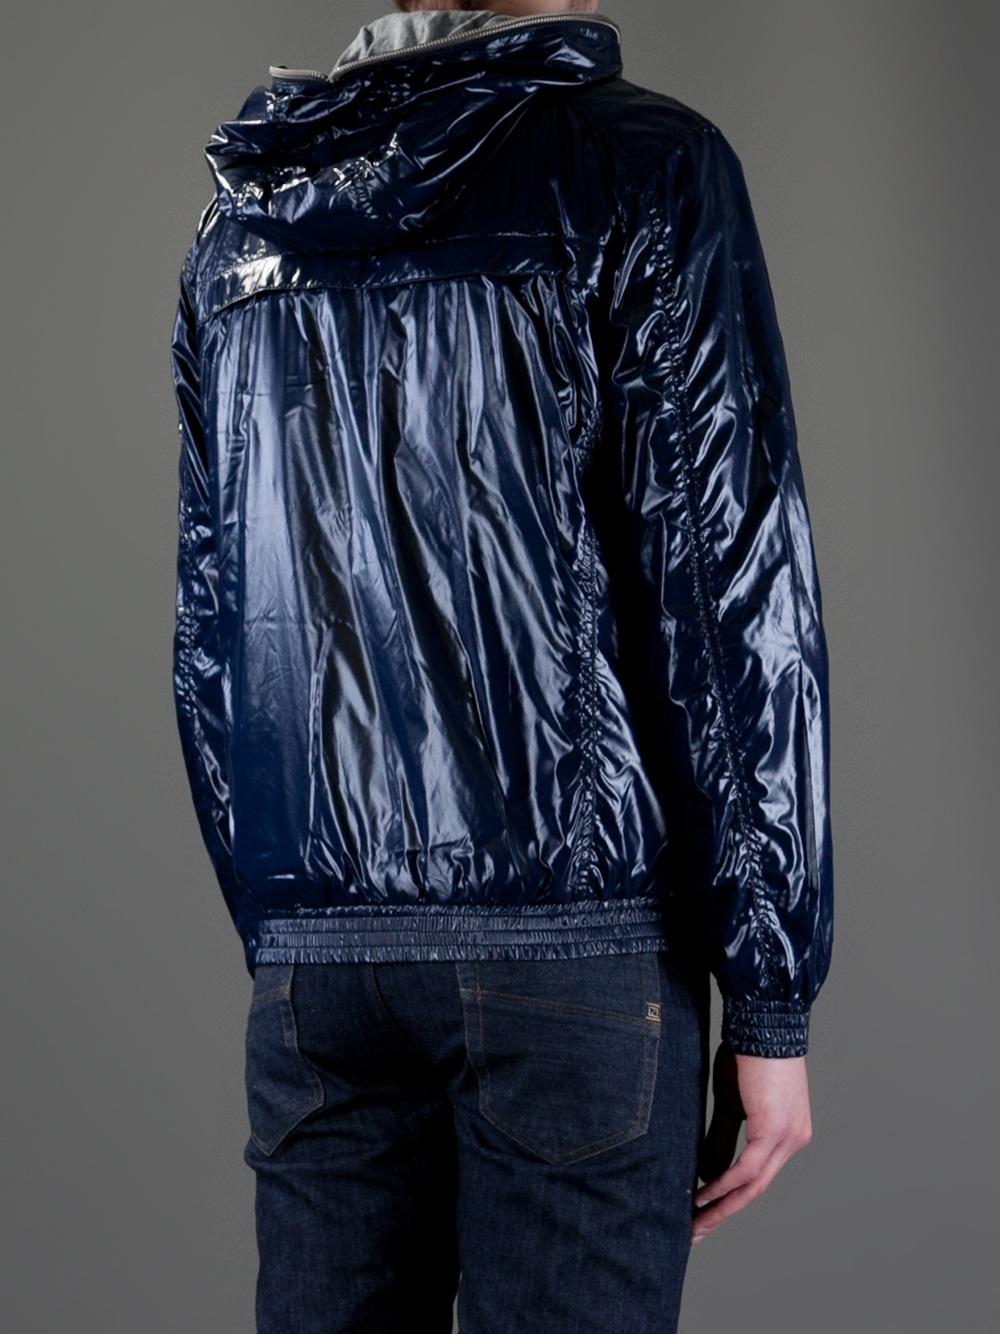 Lyst Duvetica Shiny Jacket In Blue For Men